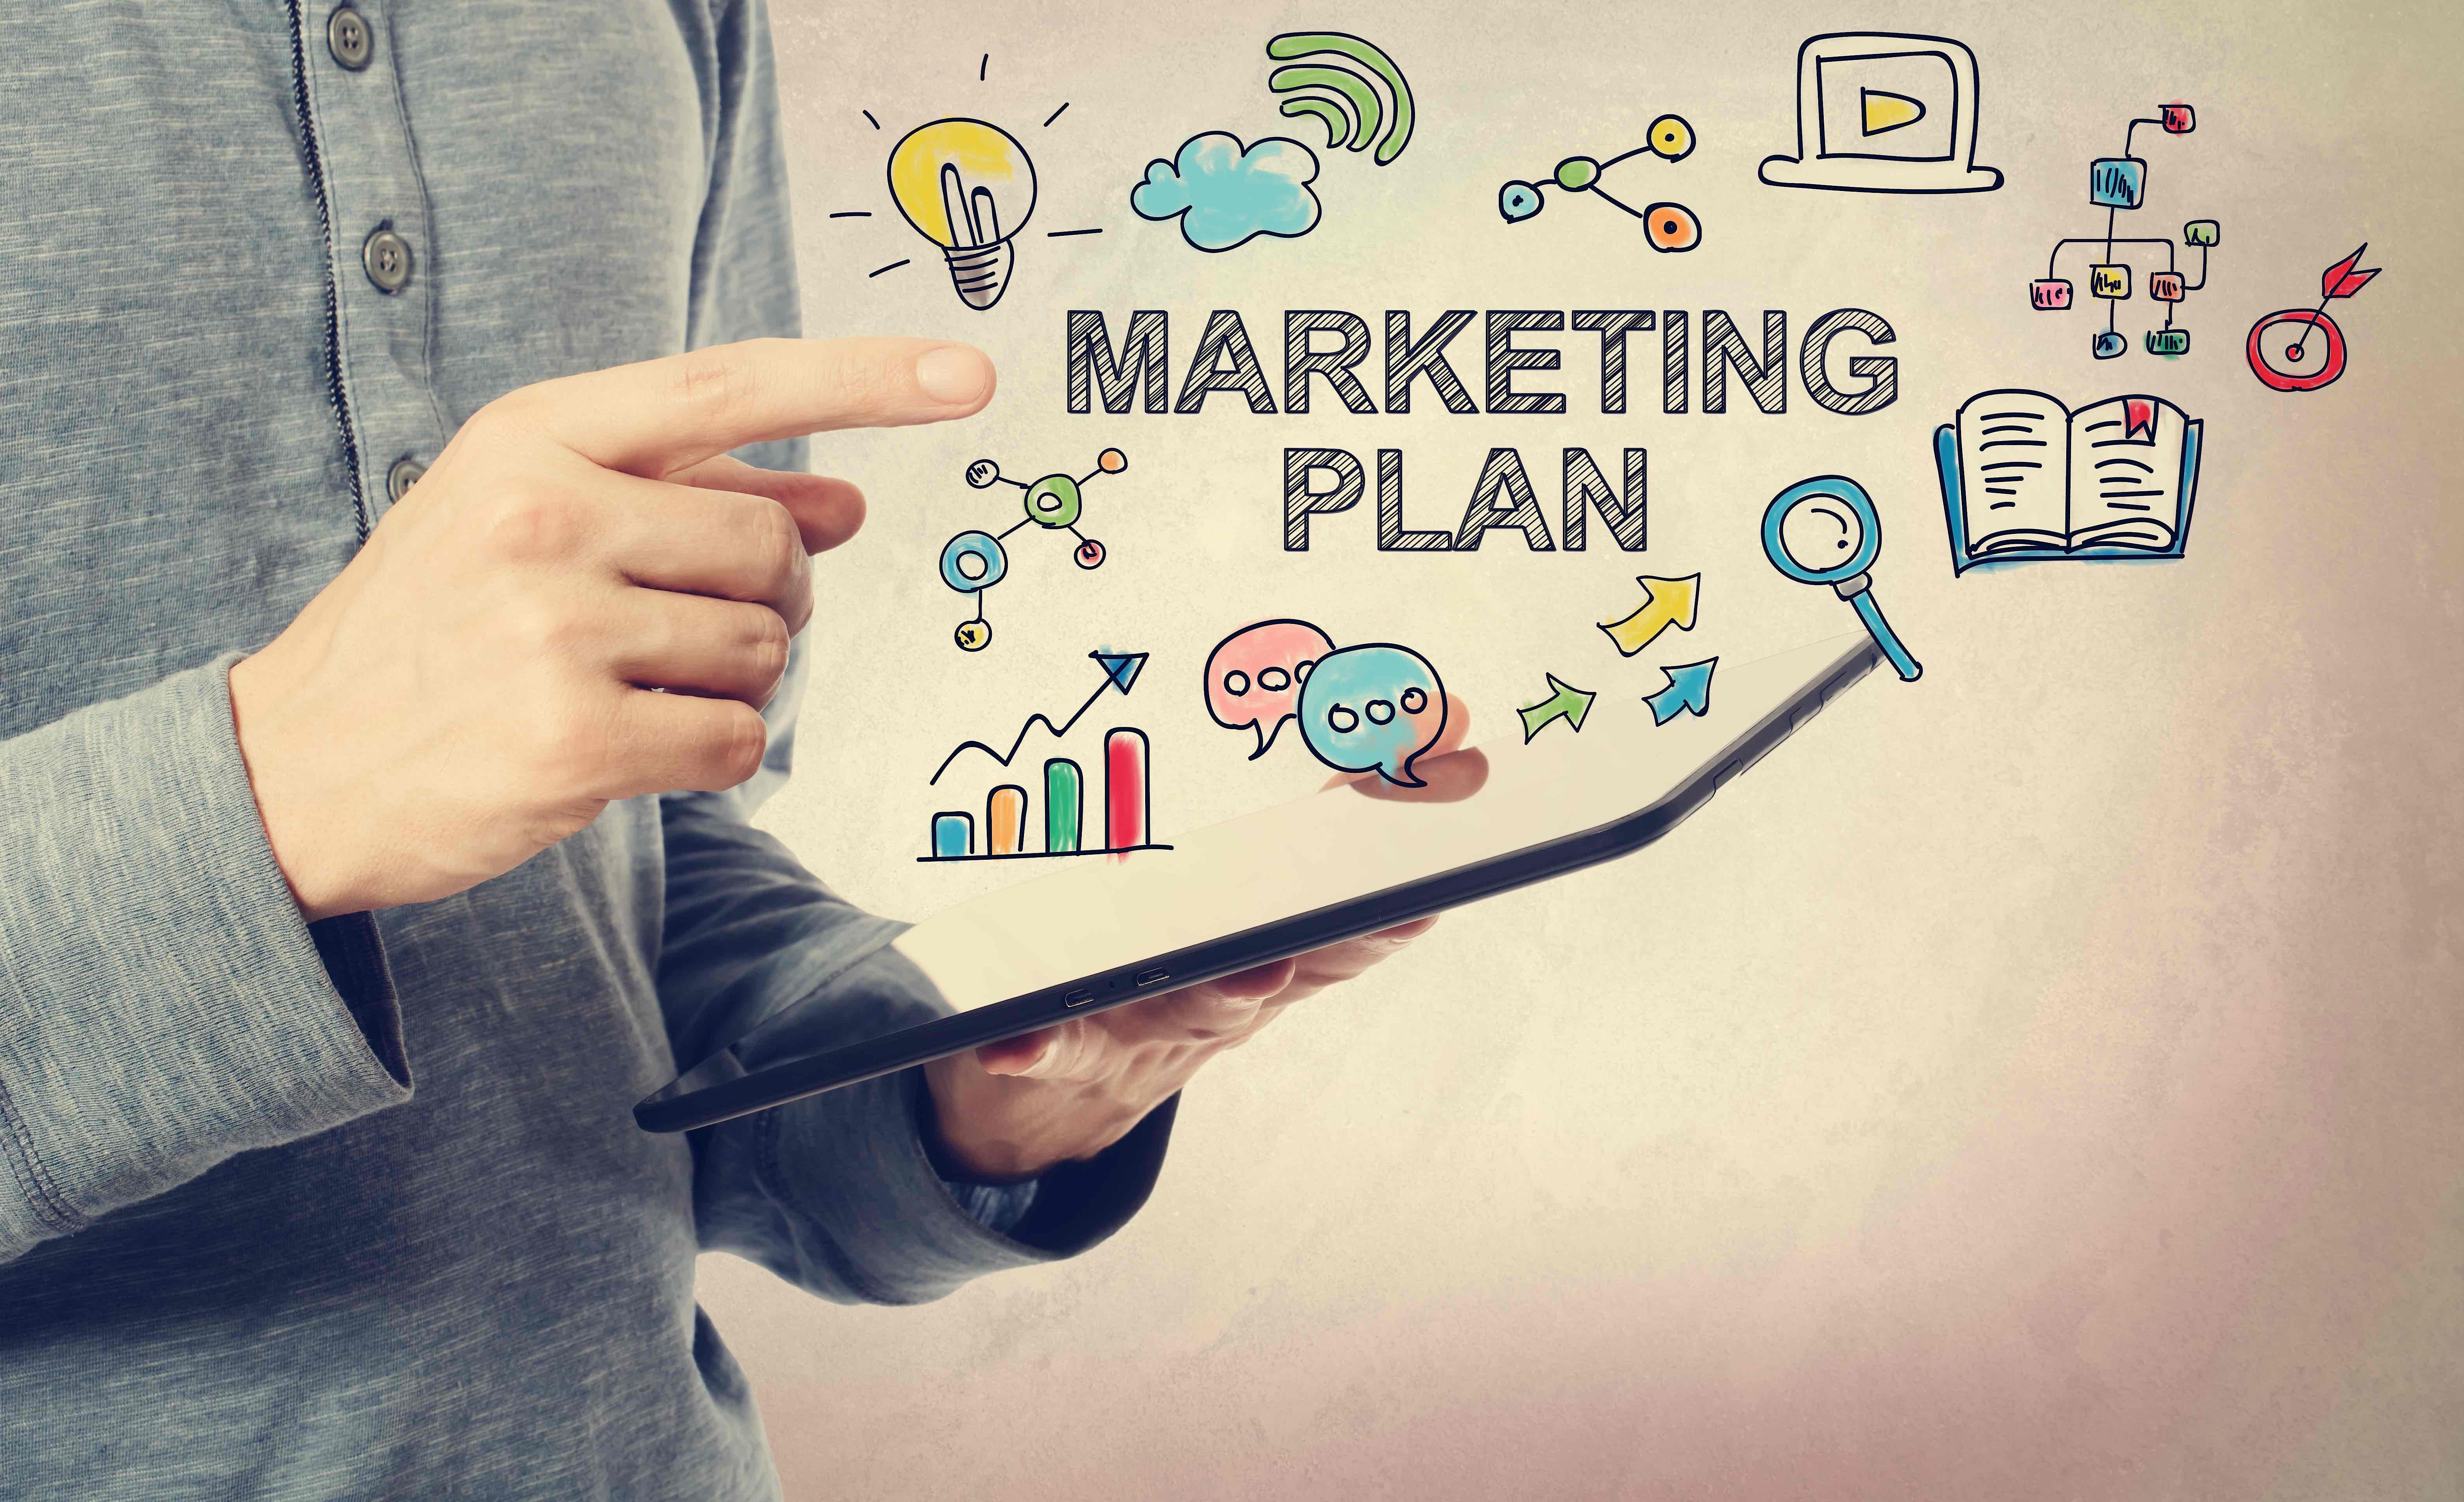 Marketing strategy resolutions